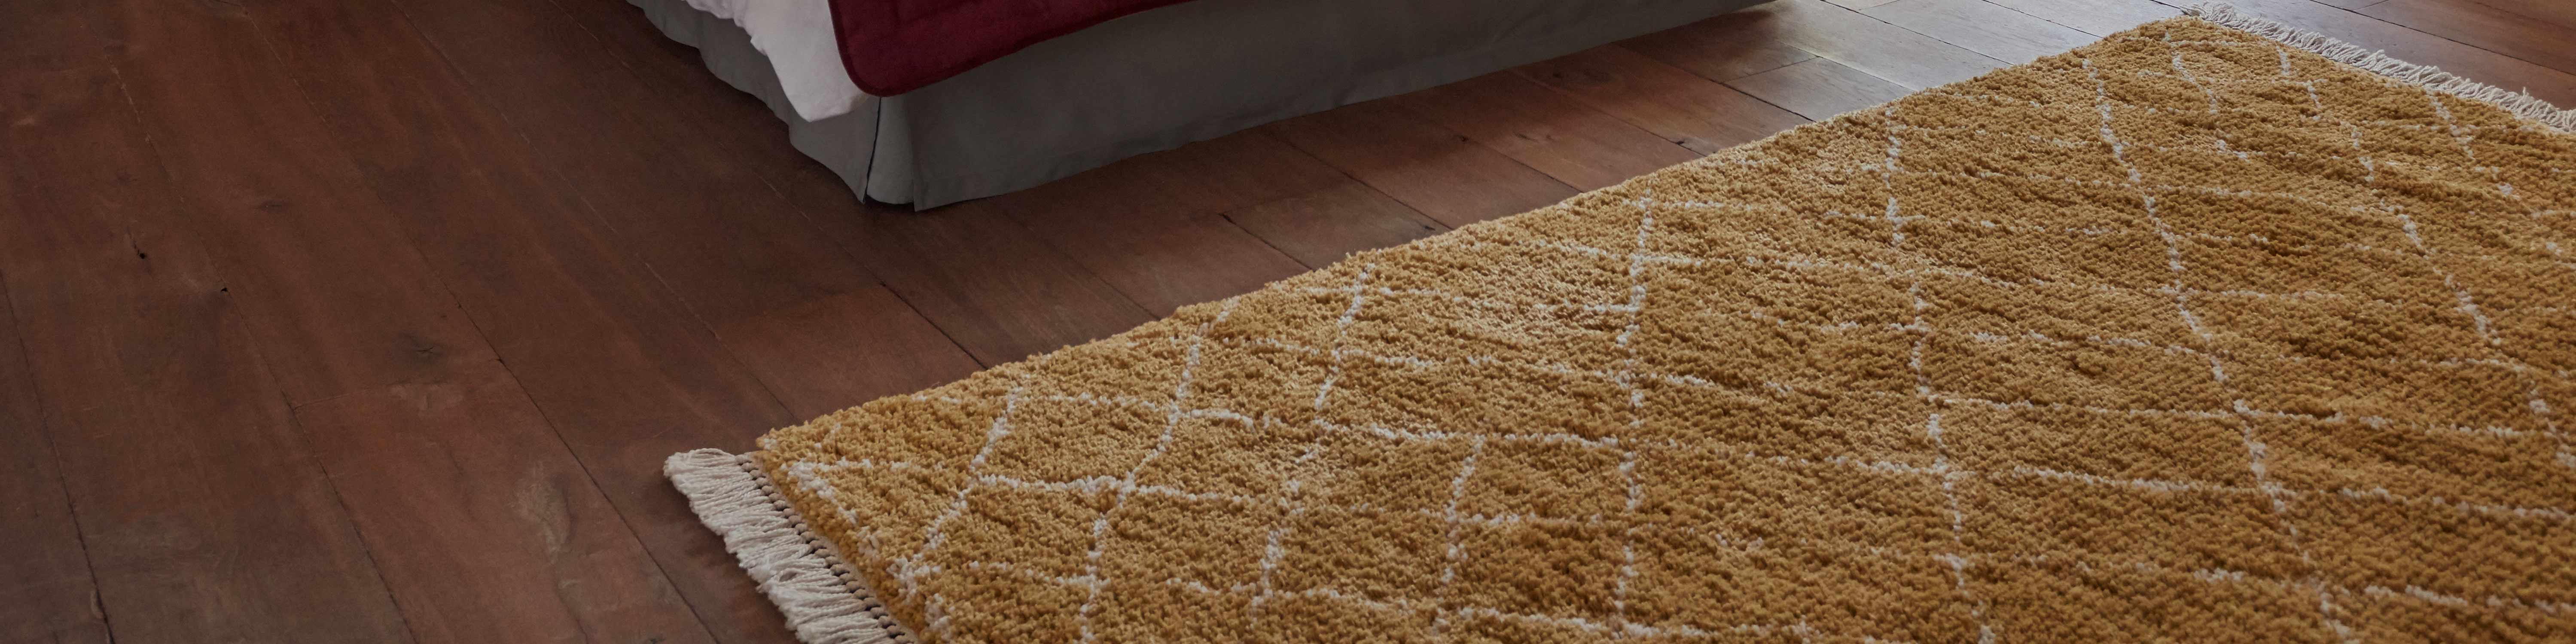 tapis jaune tapis moutarde tapis camel tapis jaune moutarde saint maclou